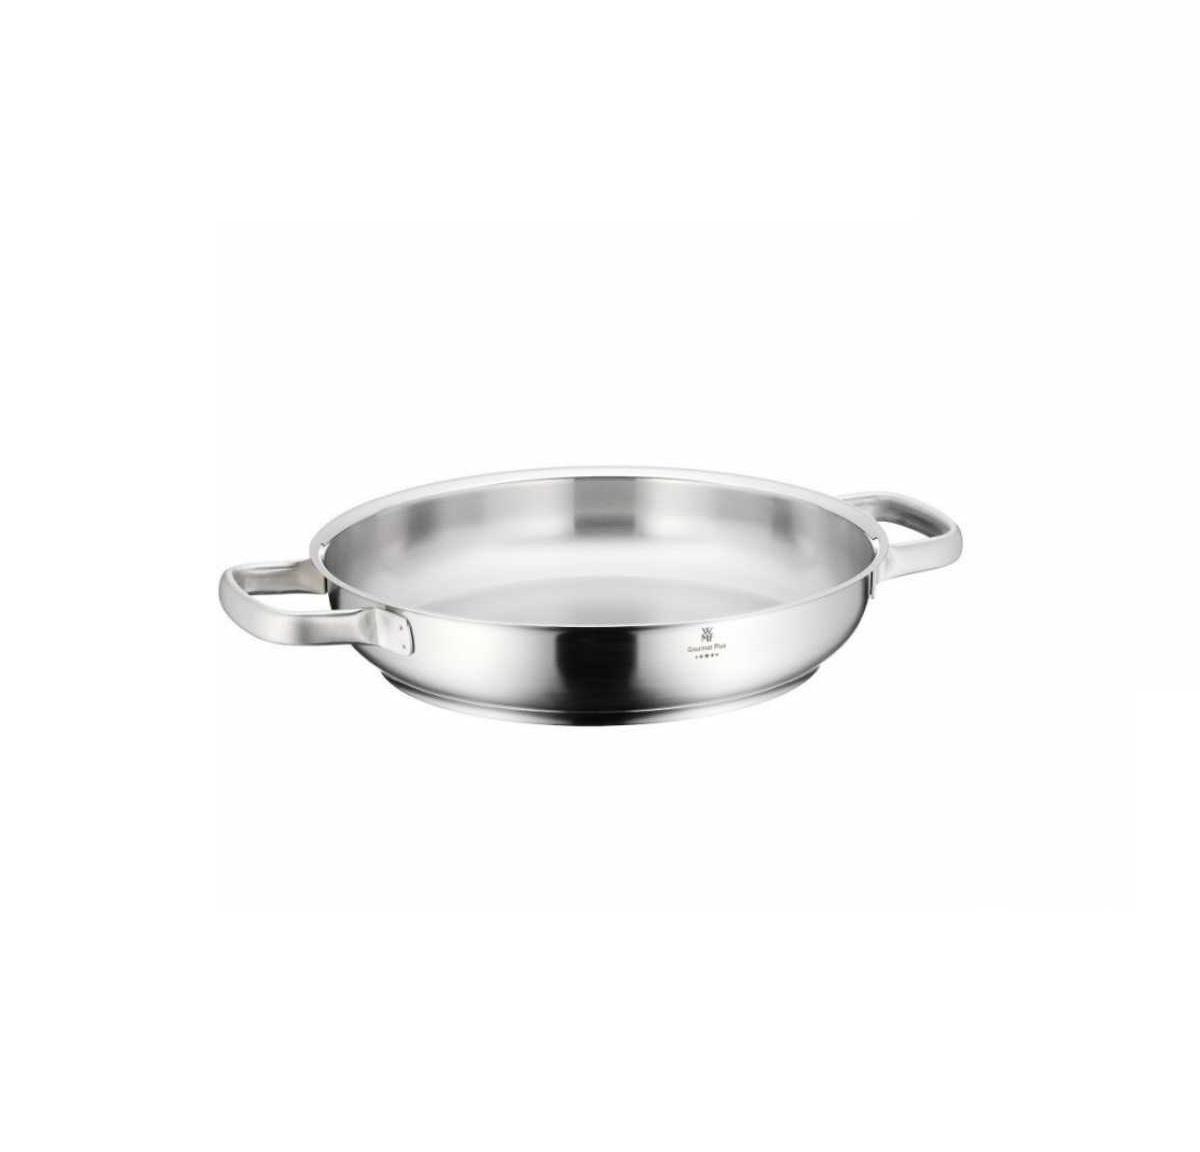 Сковорода WMF GOURMET PLUS, диаметр 28 см, серебристый WMF 07 2628 6031 фото 1